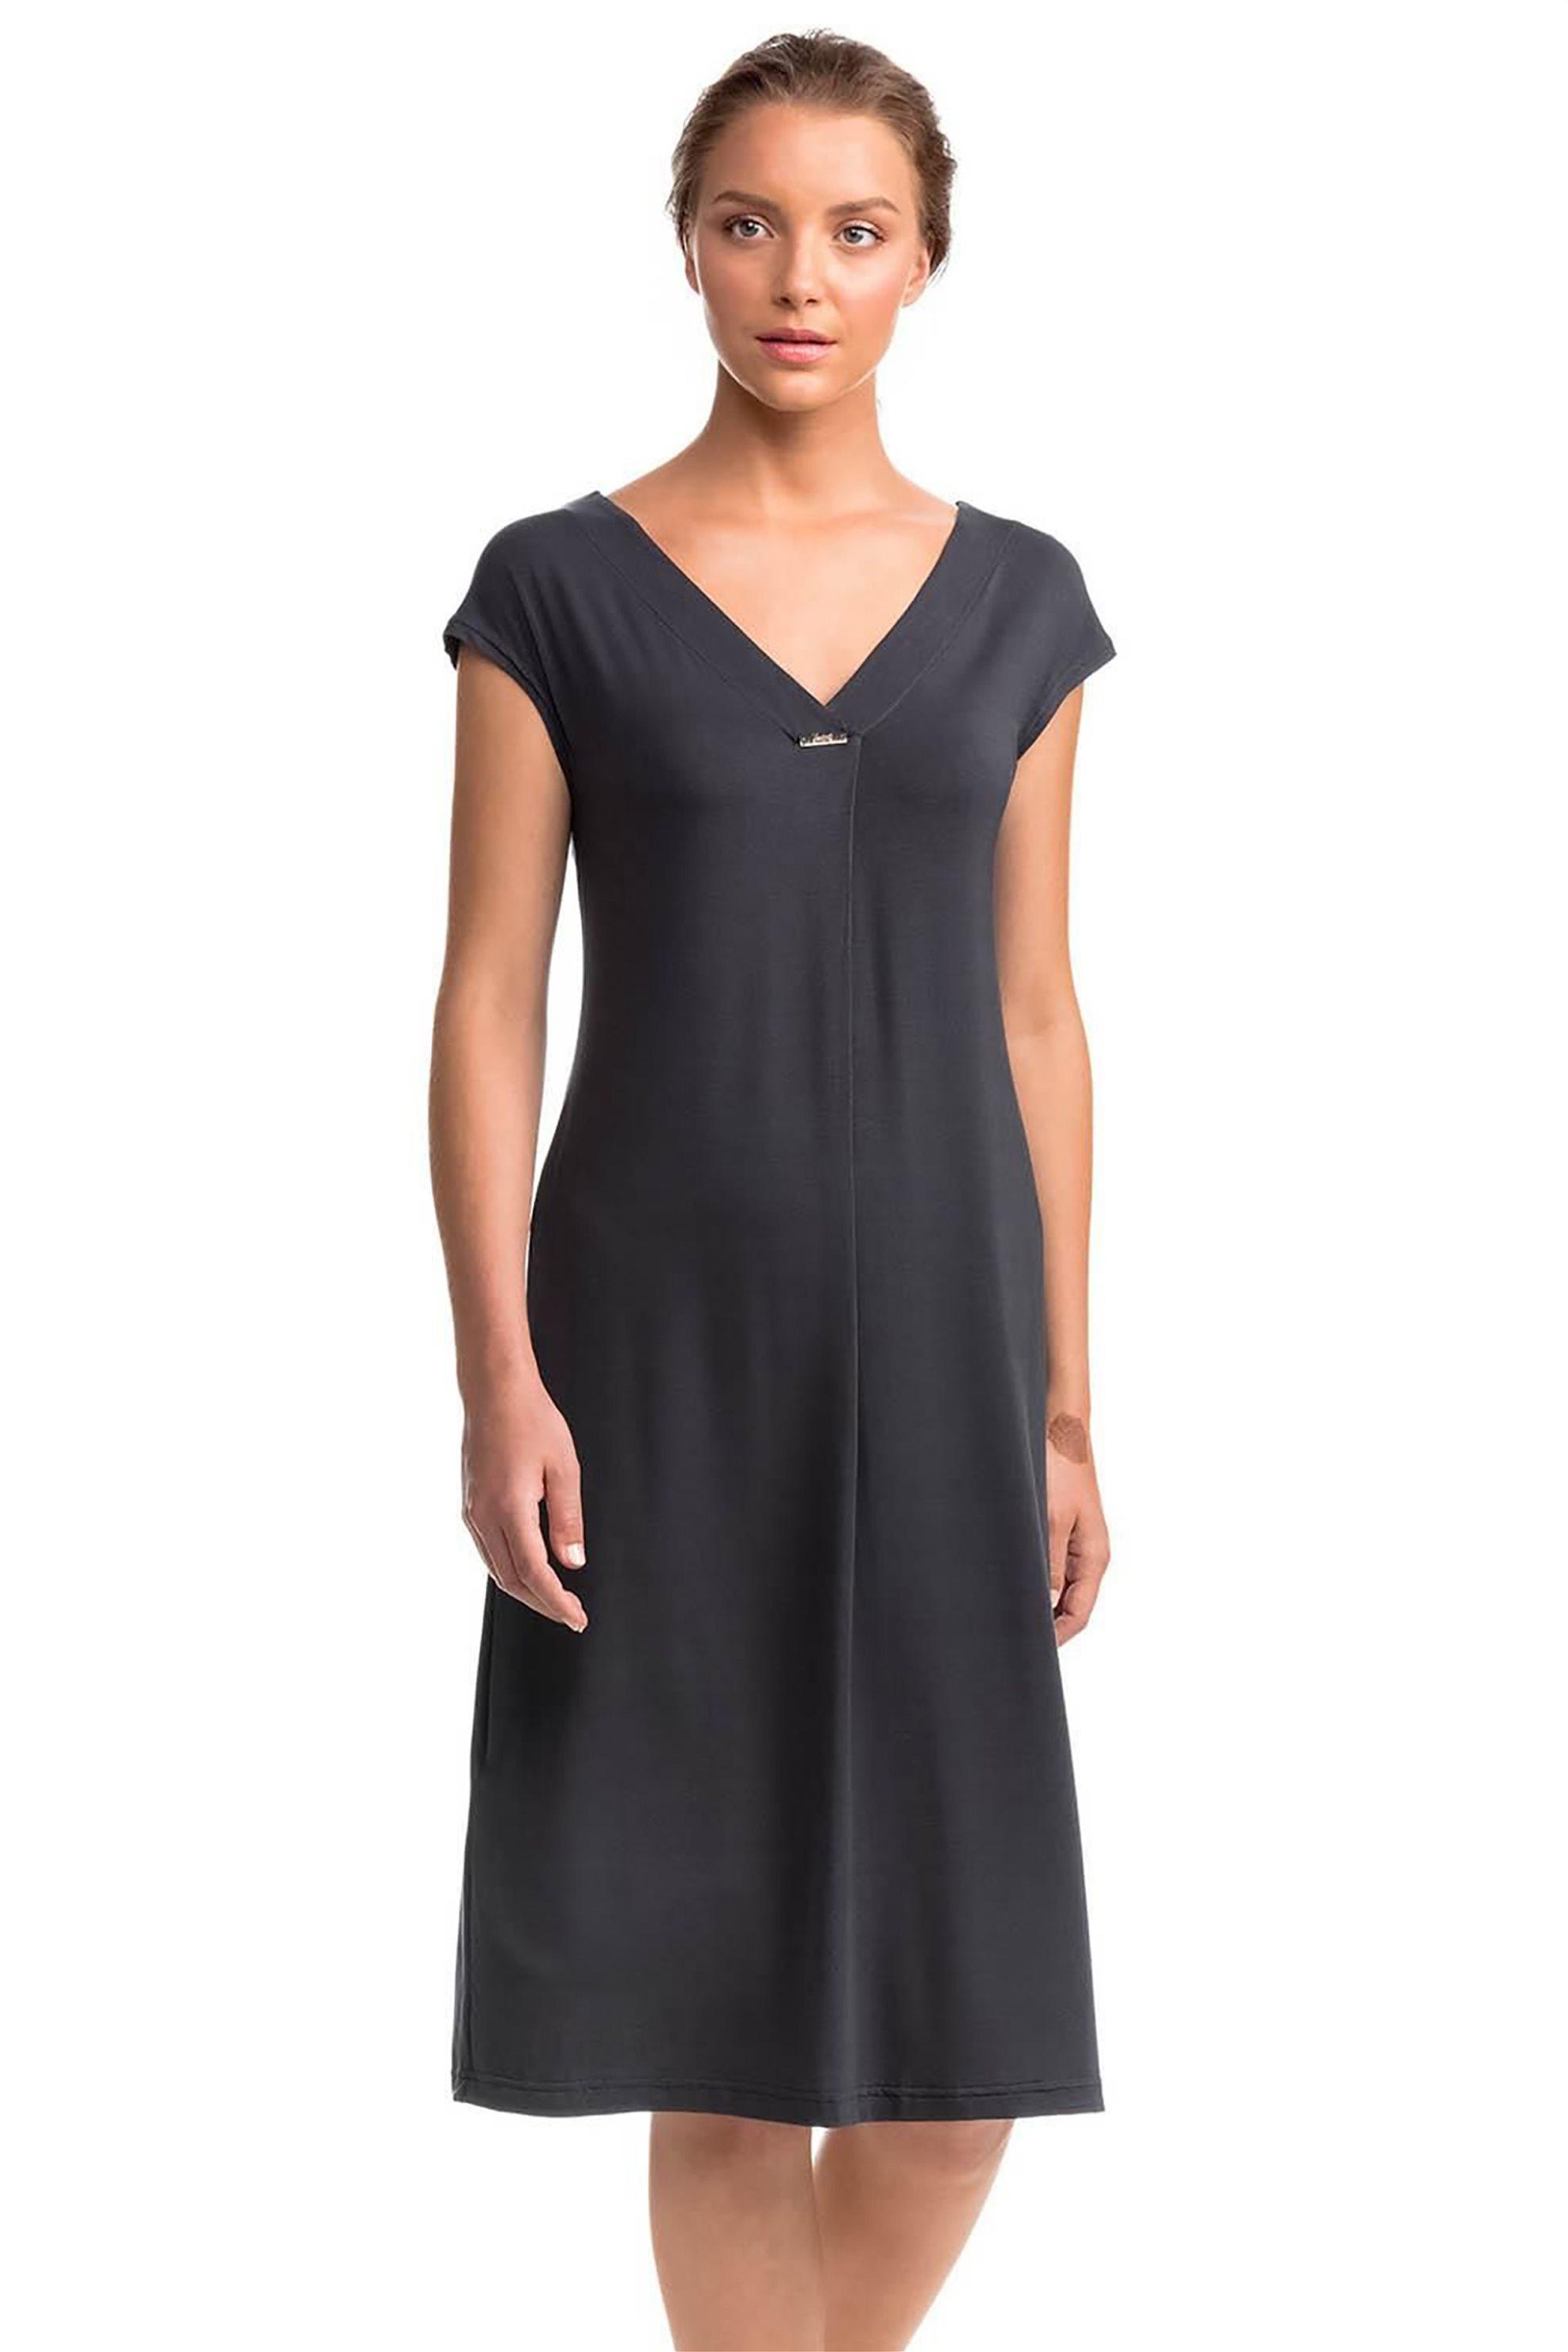 Vamp γυναικείo φόρεμα παραλίας μονόχρωμο - 14521 - Ανθρακί